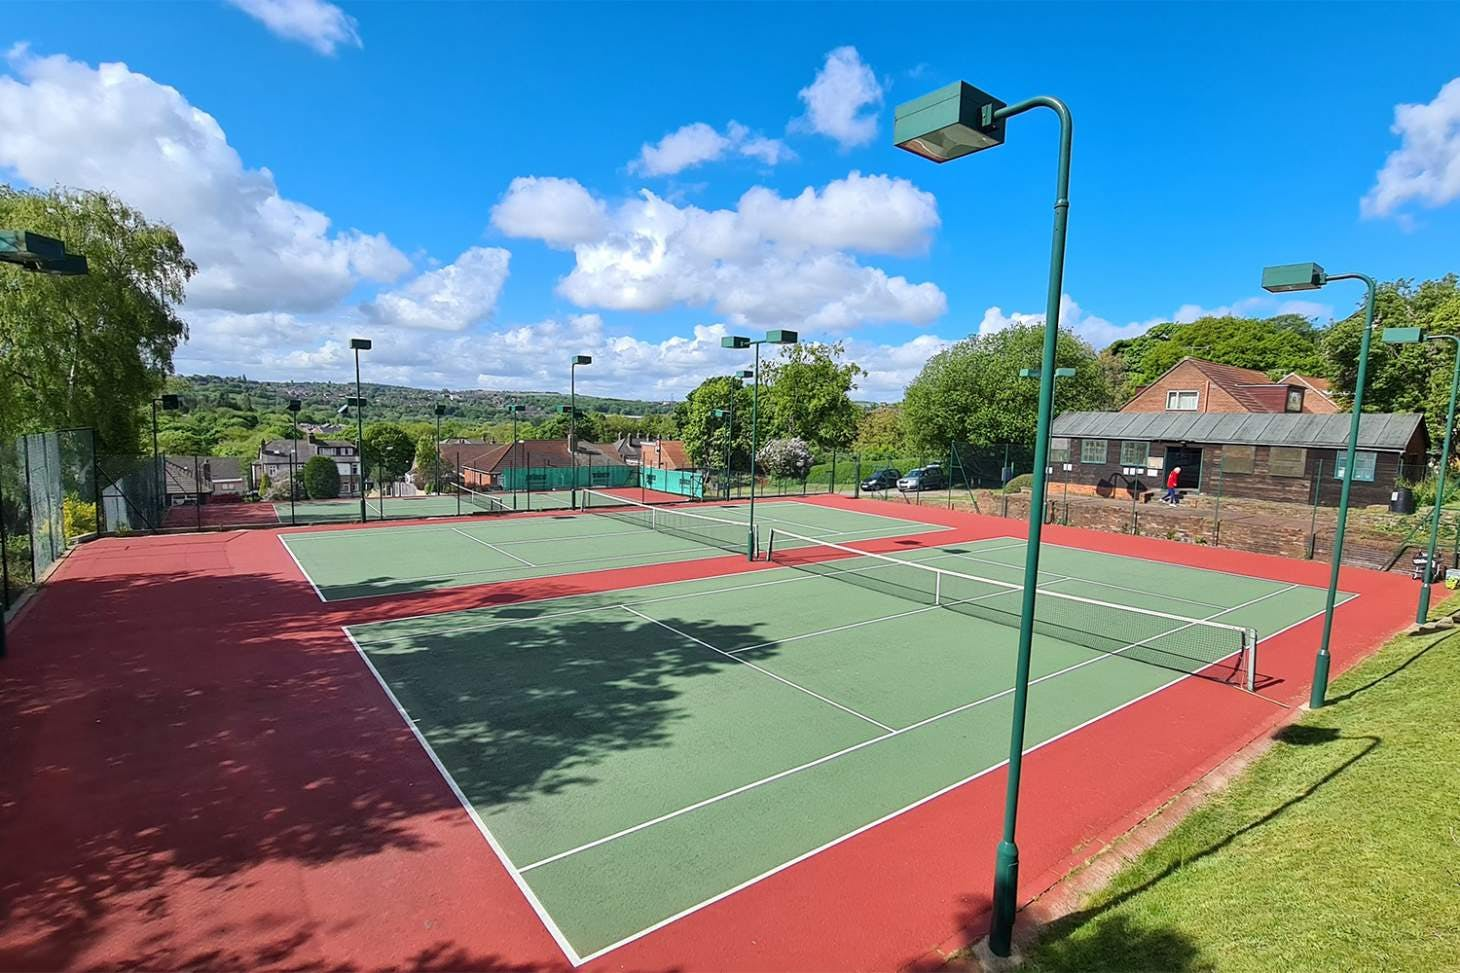 Horsforth Tennis Club Outdoor | Hard (macadam) tennis court